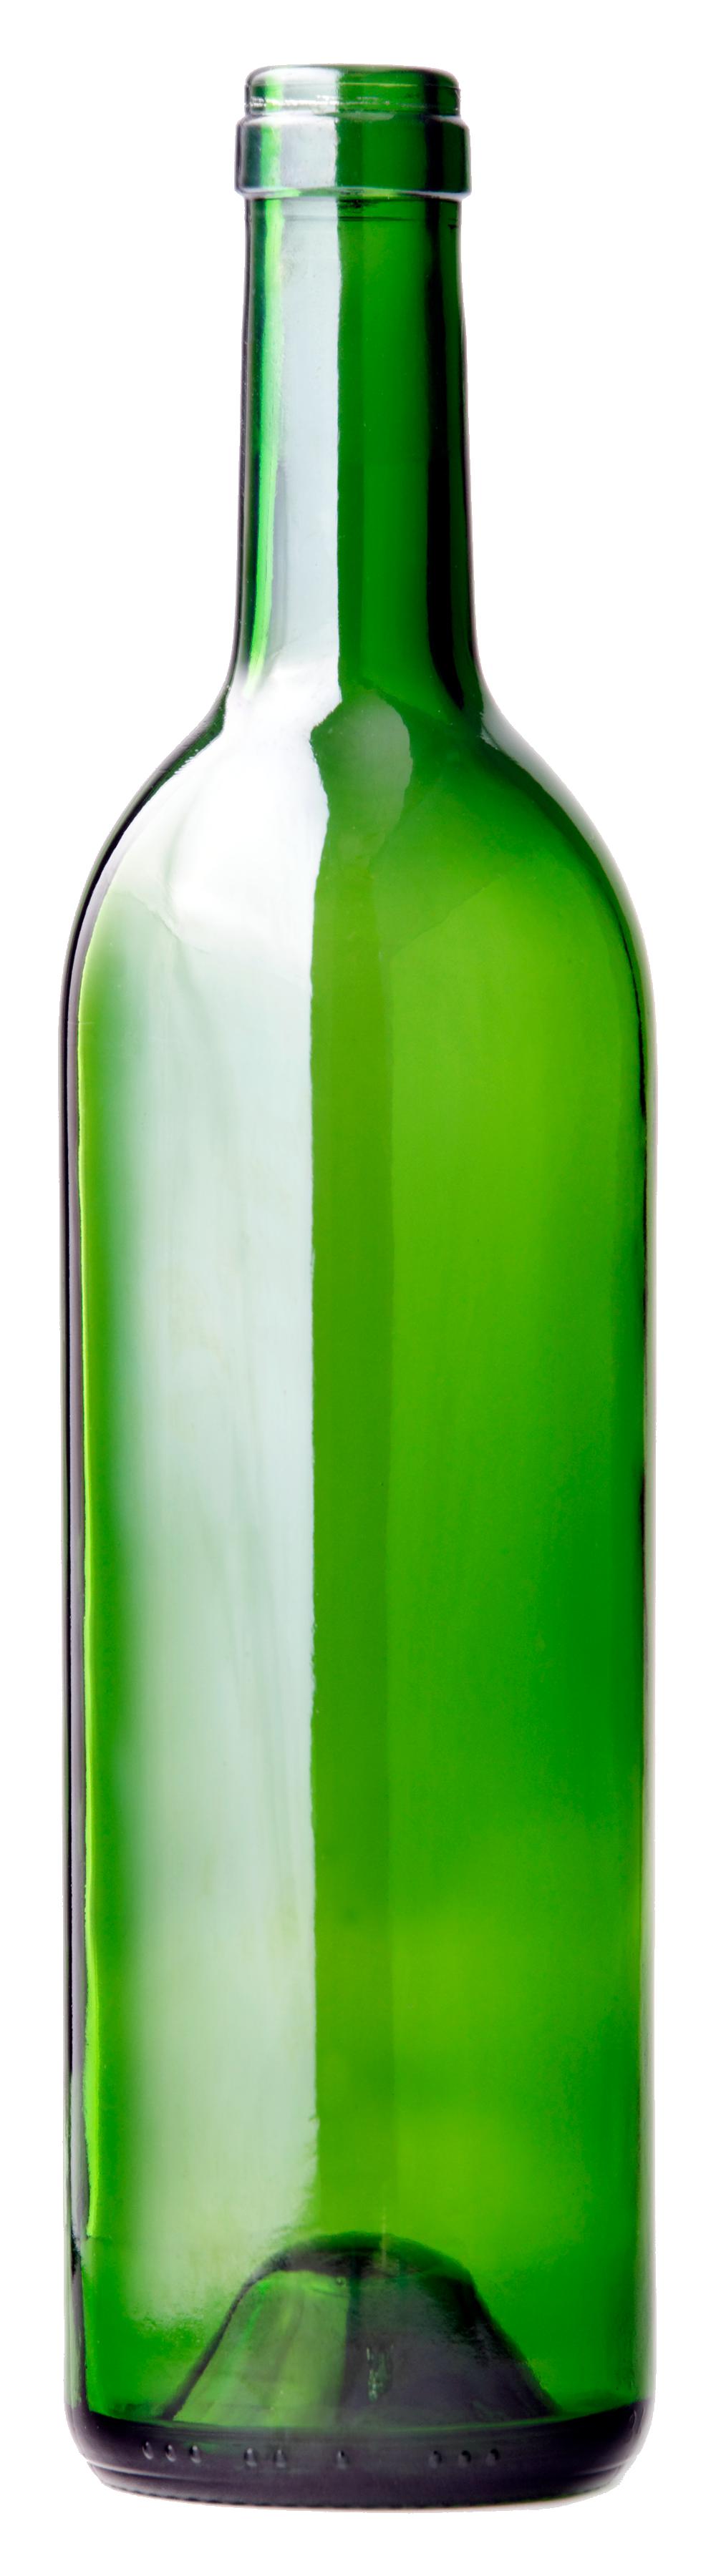 Bottle PNG images, free download.